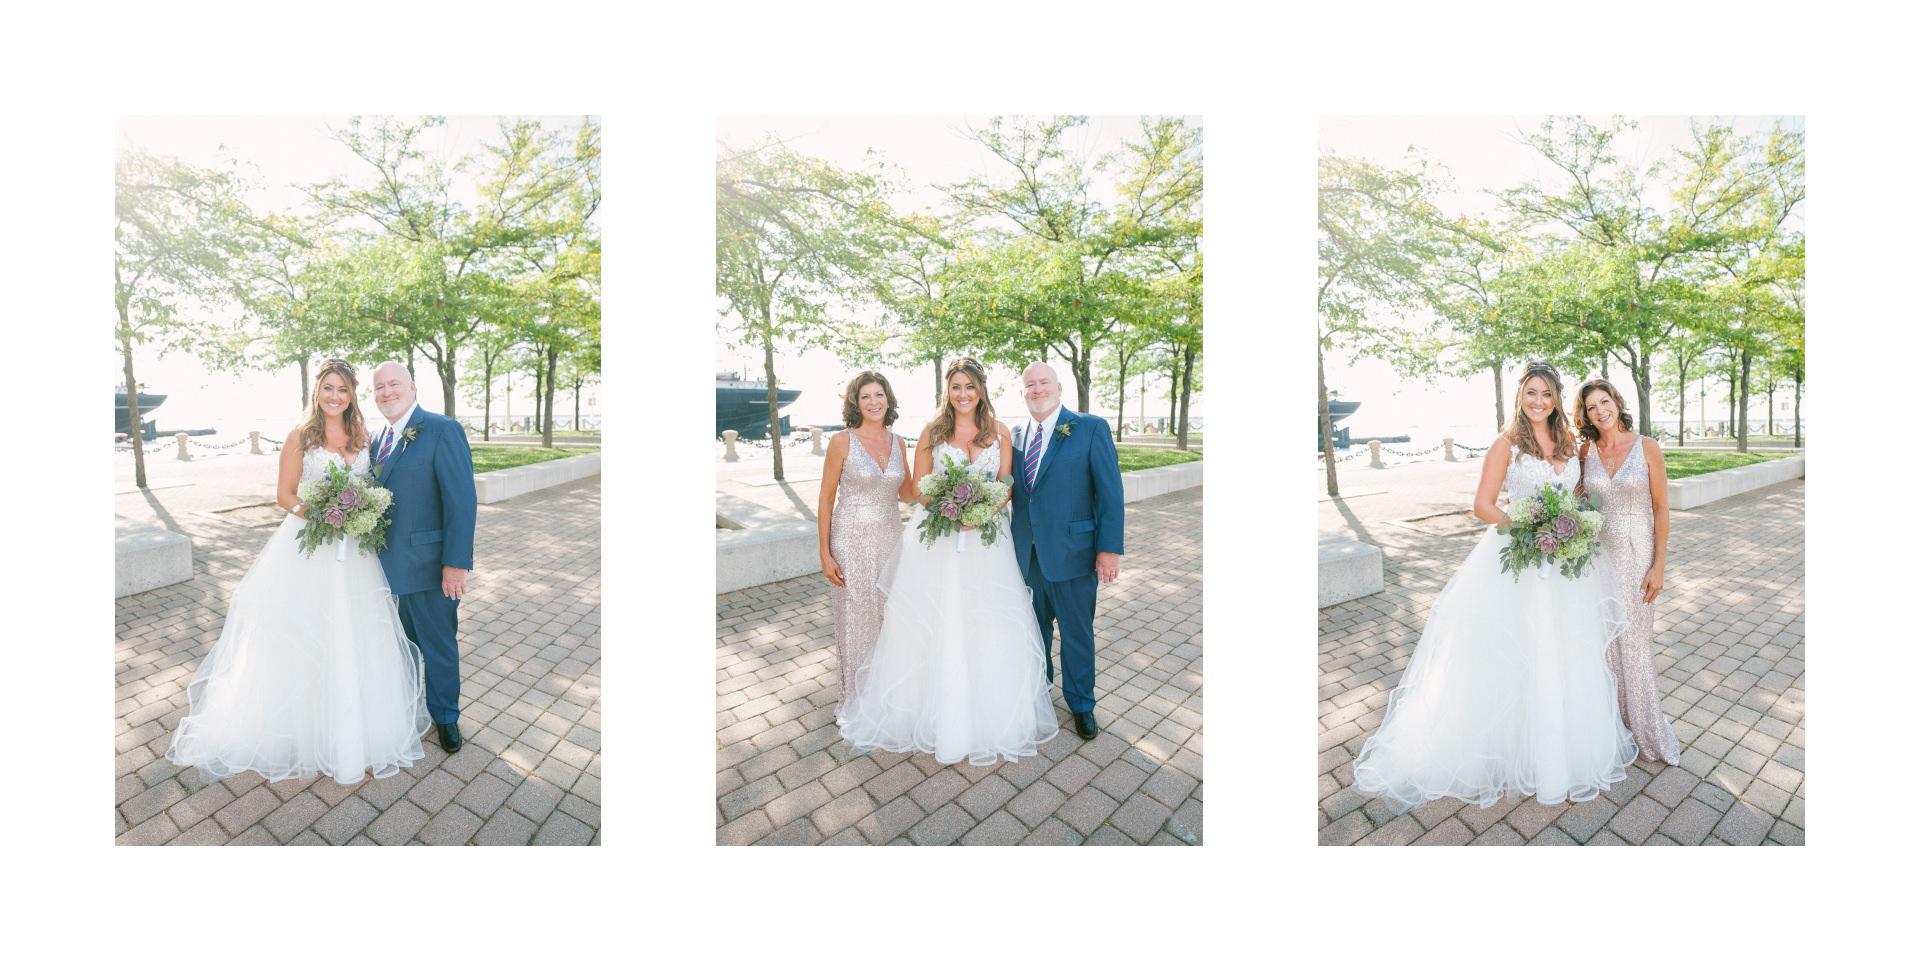 Nuevo Modern Mexican Wedding Photographer in Cleveland 1 29.jpg